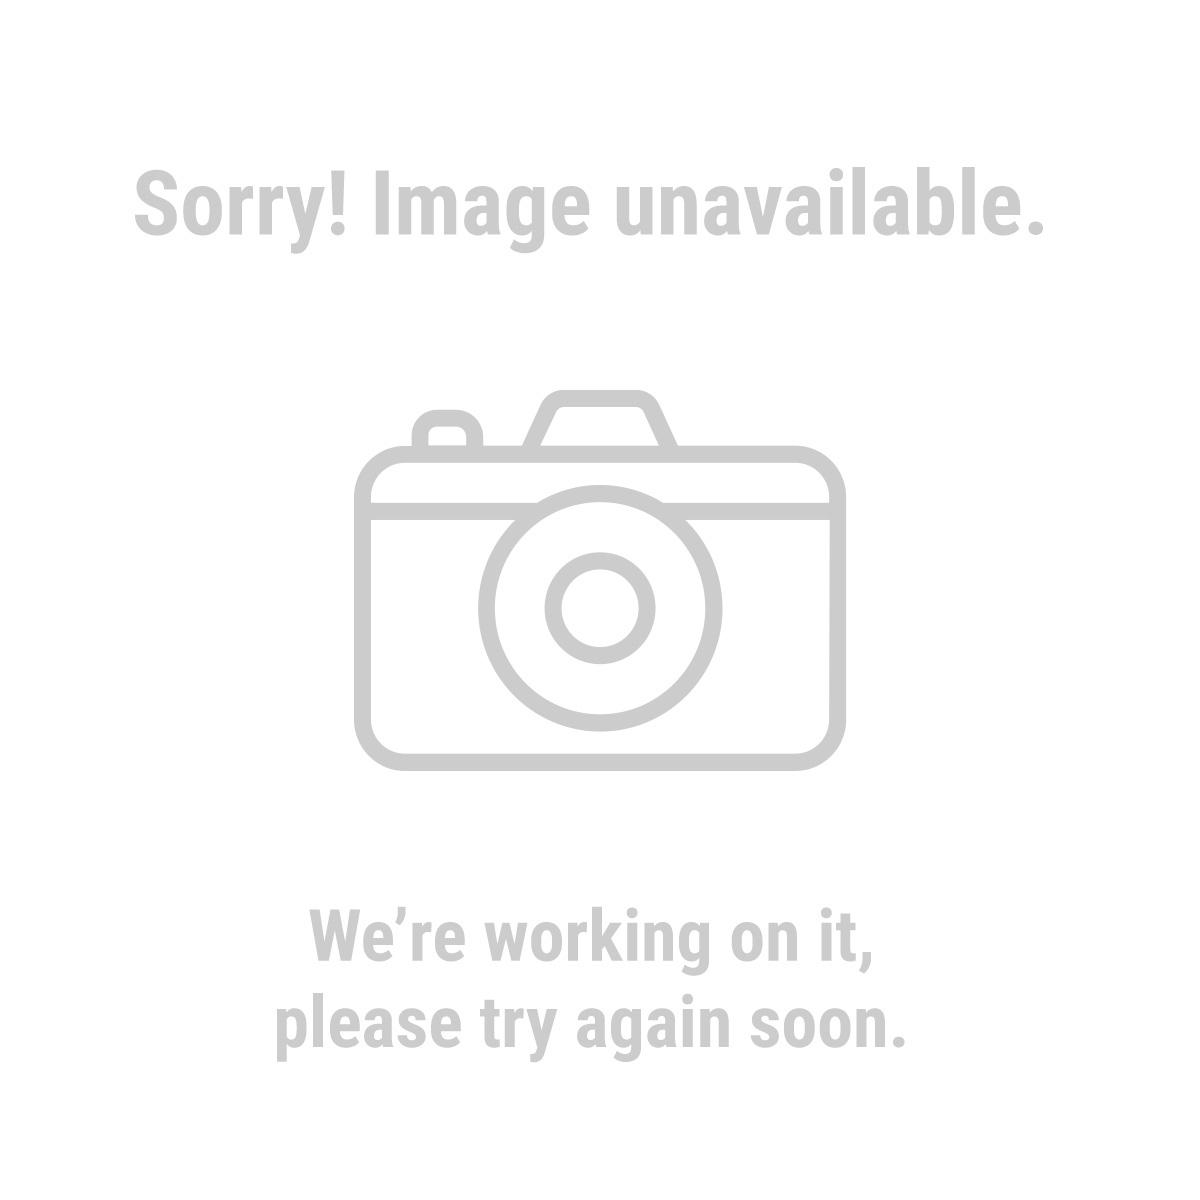 Cen-Tech 98674 5-in-1 Digital Multimeter